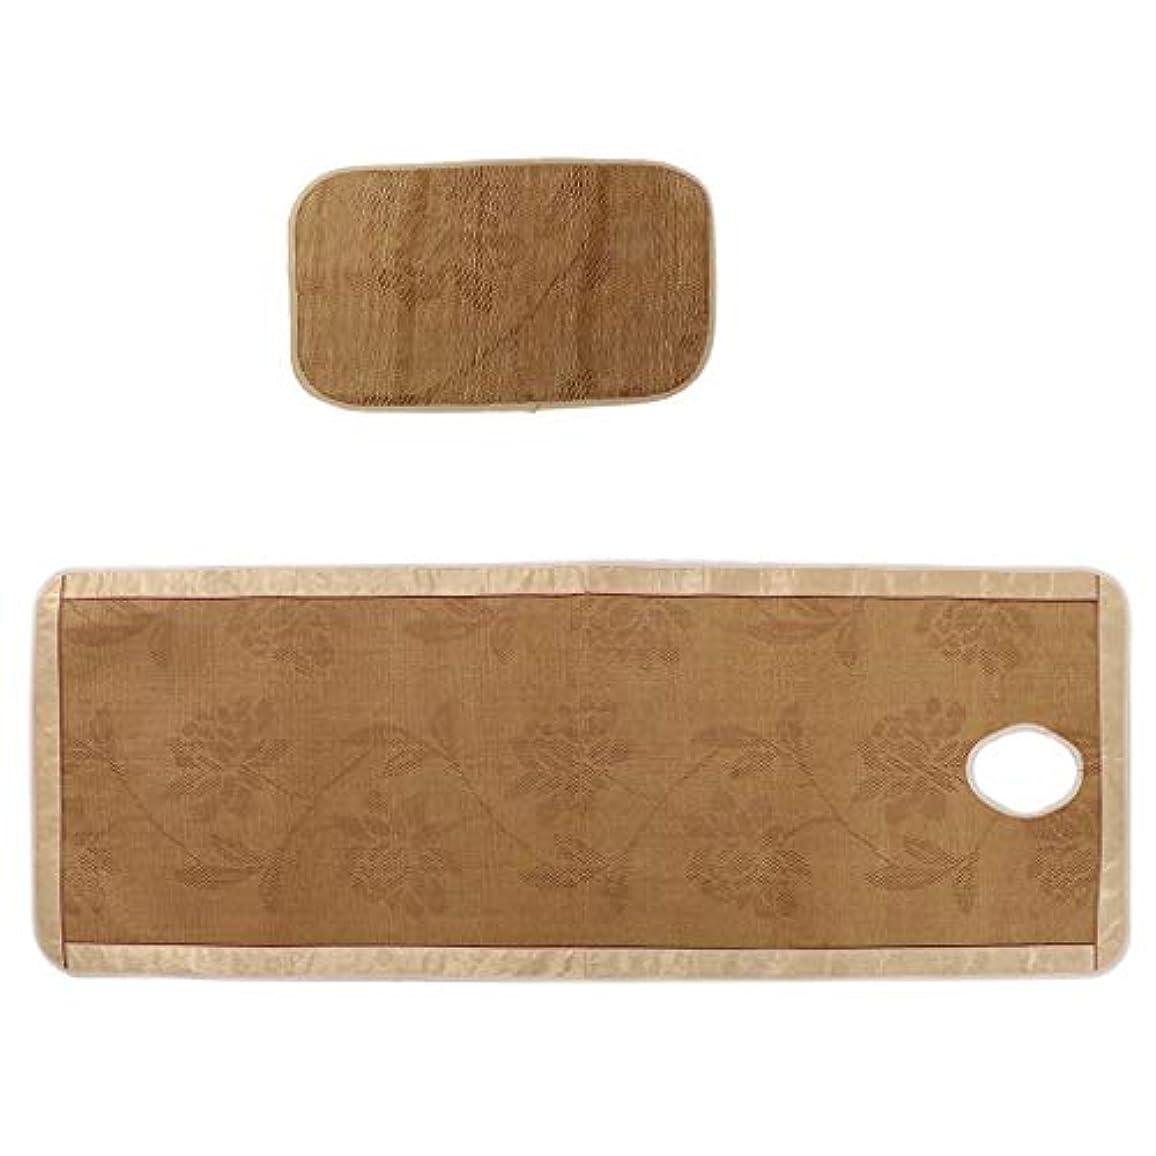 FLAMEER マッサージ台 ベッドシーツ 枕カバー付き エステベッドカバー 接触冷感 クール 快適性 - フローラル1